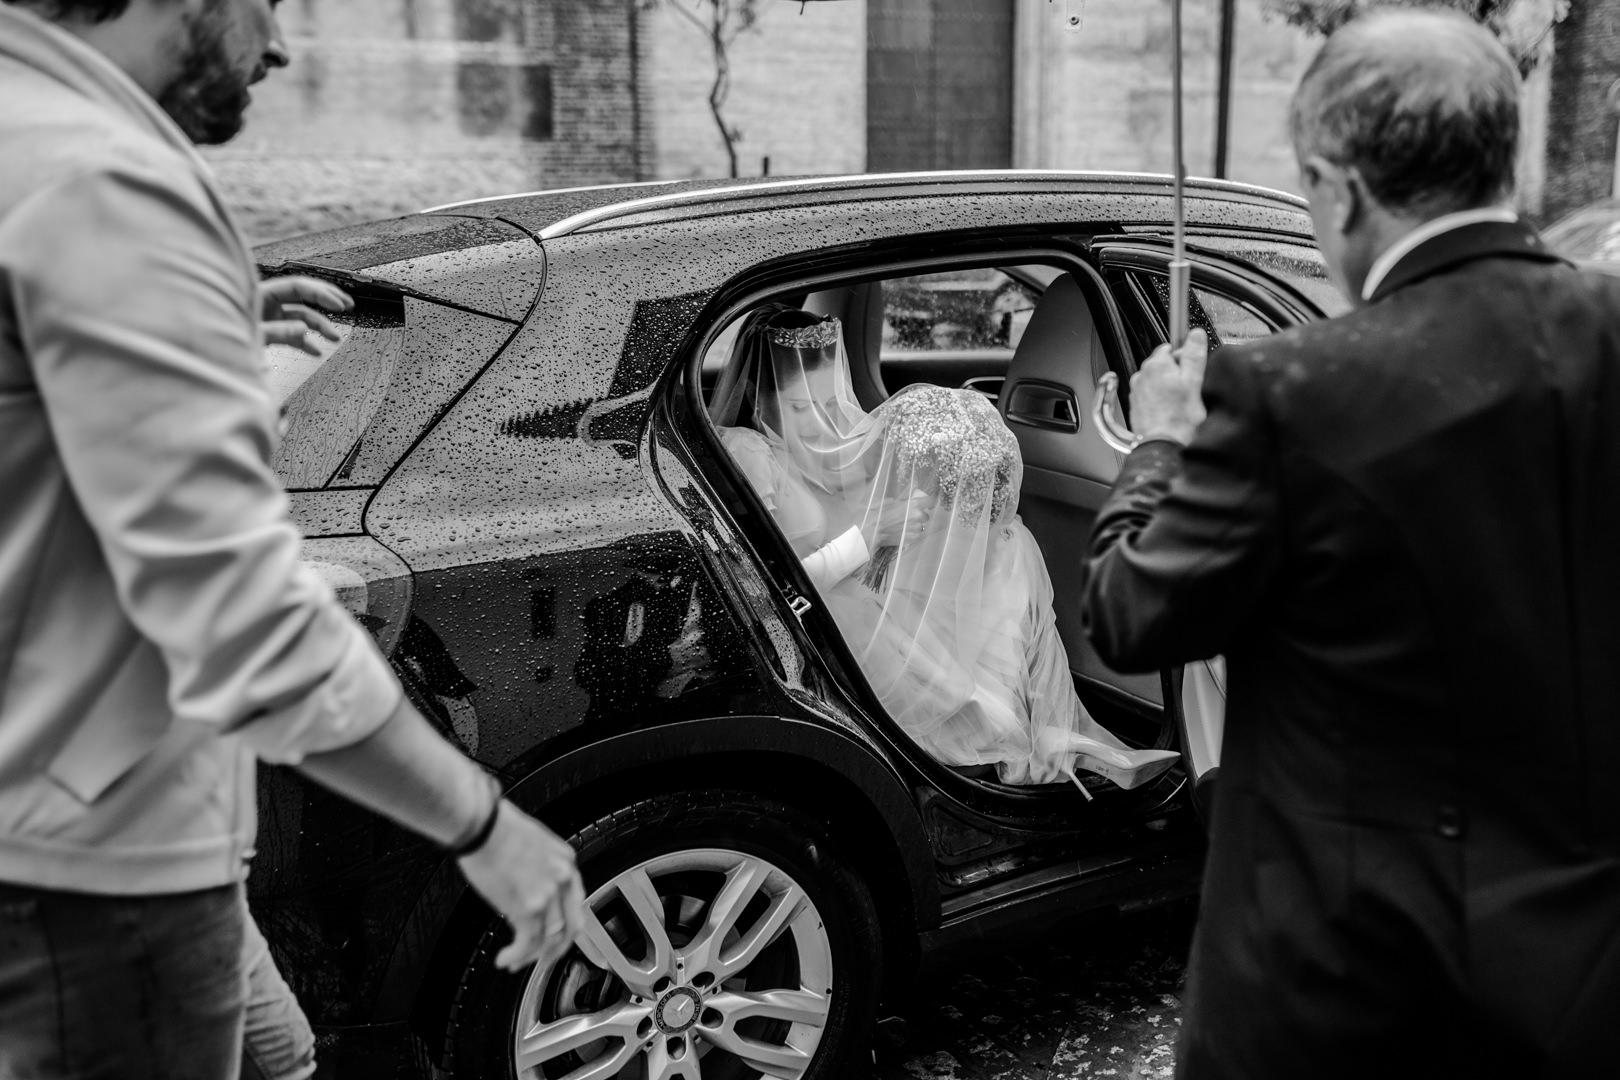 Boda-sevilla-Wedding-engagement-Rafael-Torres-fotografo-bodas-sevilla-madrid-barcelona-wedding-photographer--29.jpg